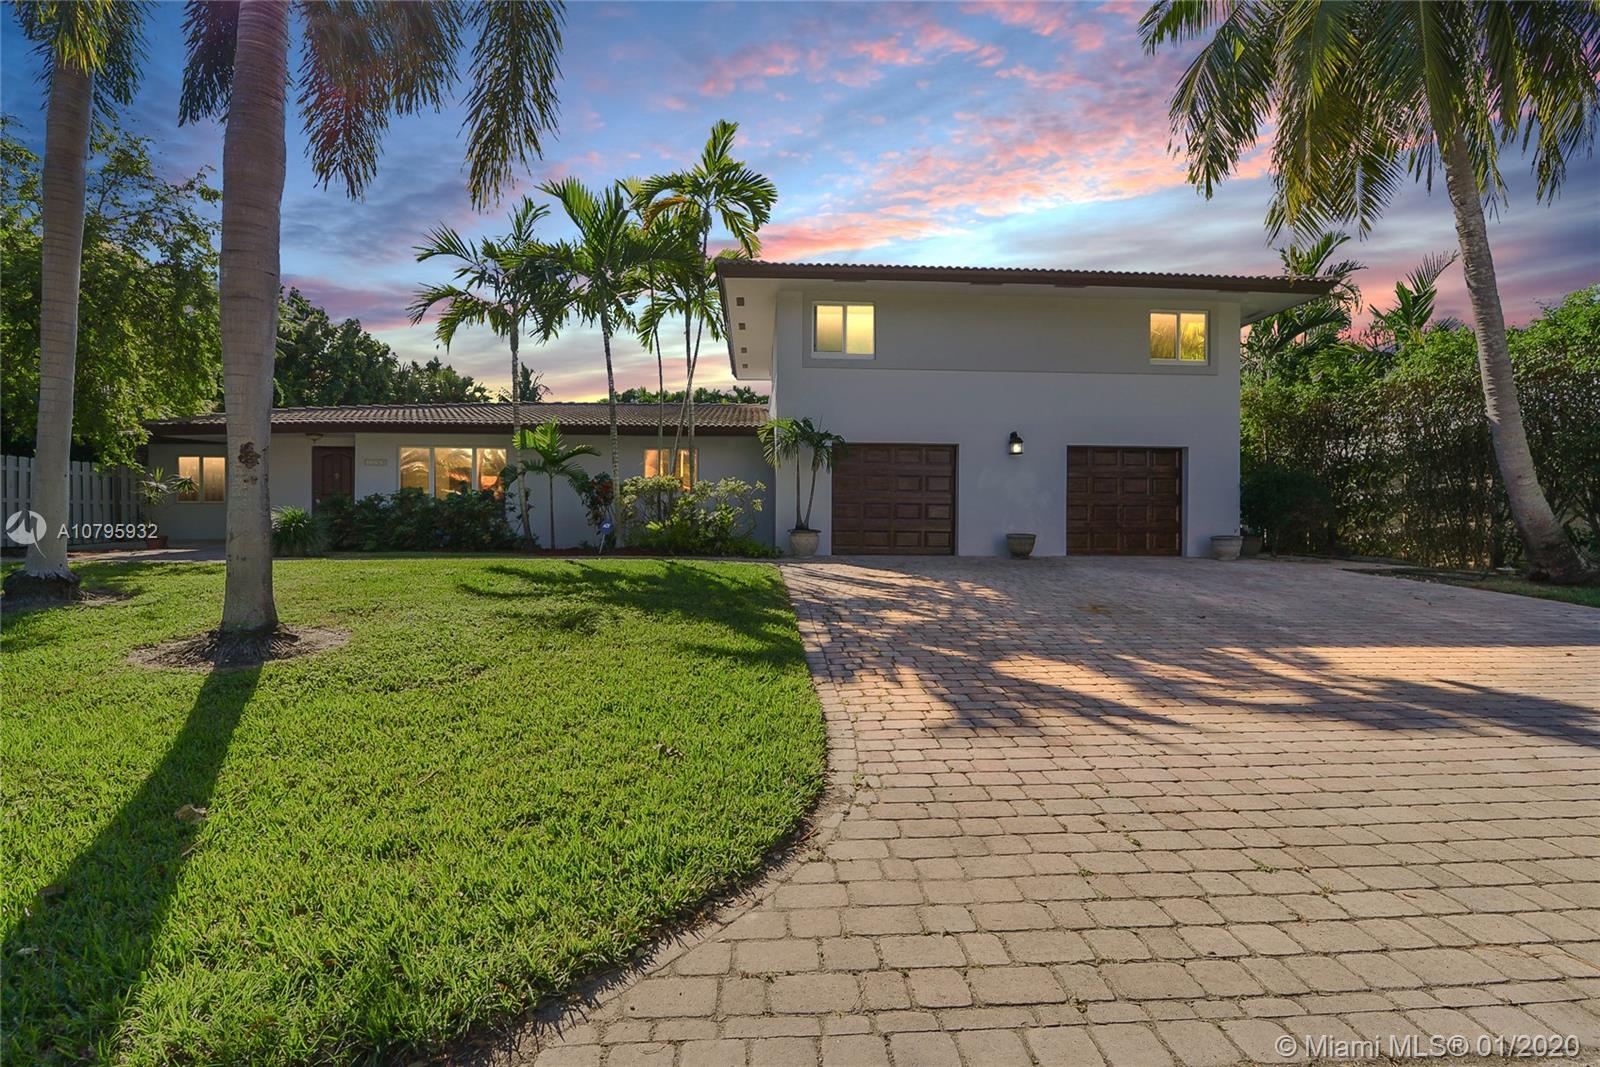 2750 NE 29th St, Fort Lauderdale, FL 33306